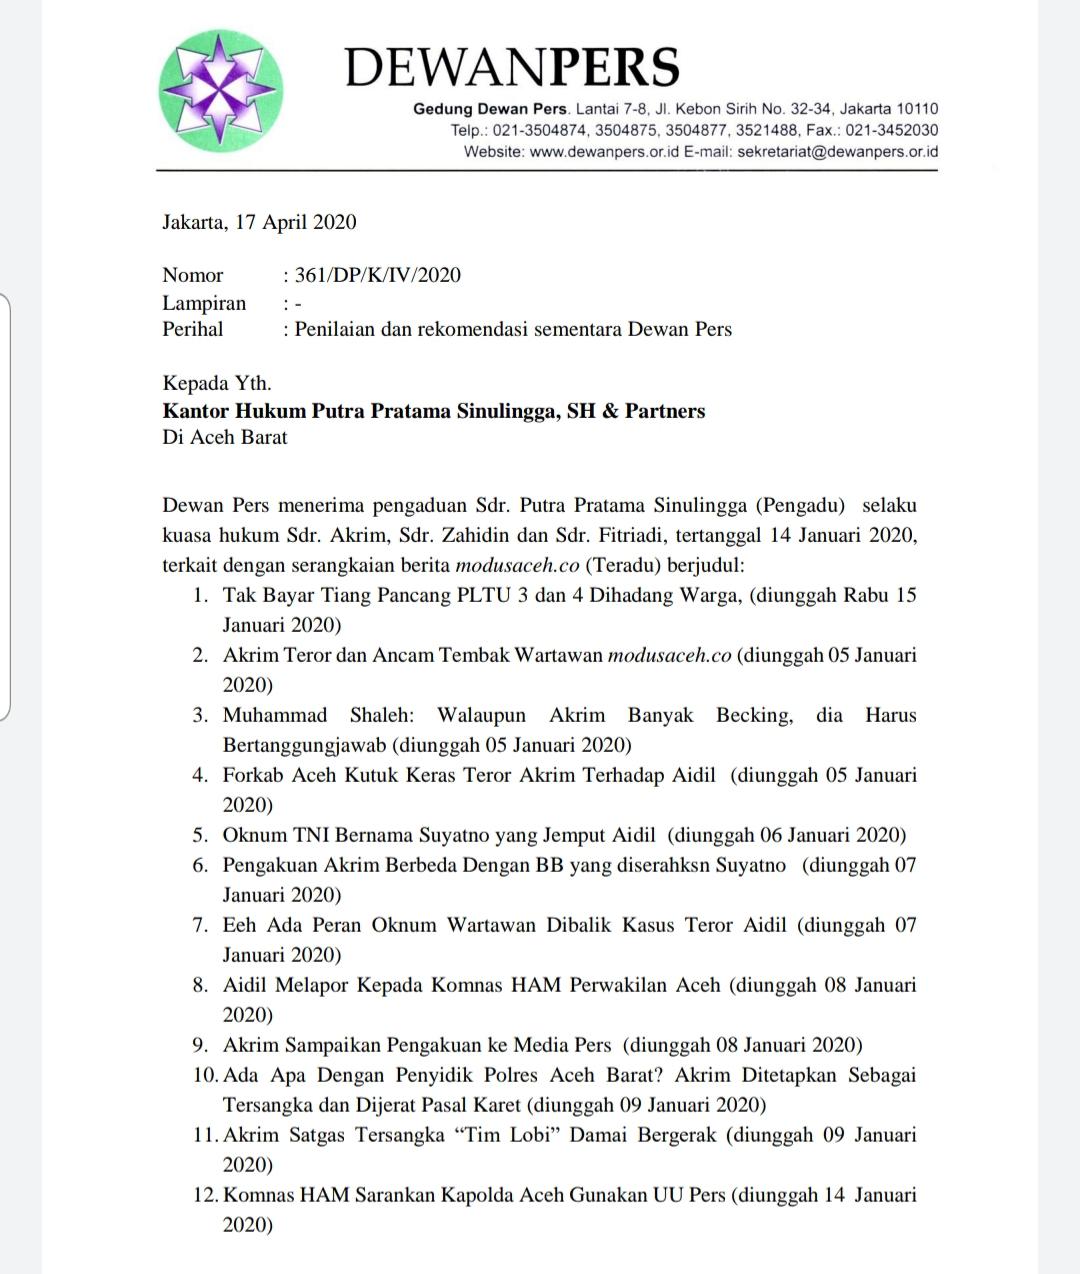 Dewan Pers: Modusaceh.co Diminta Muat Hak Jawab dan Permohonan Maaf